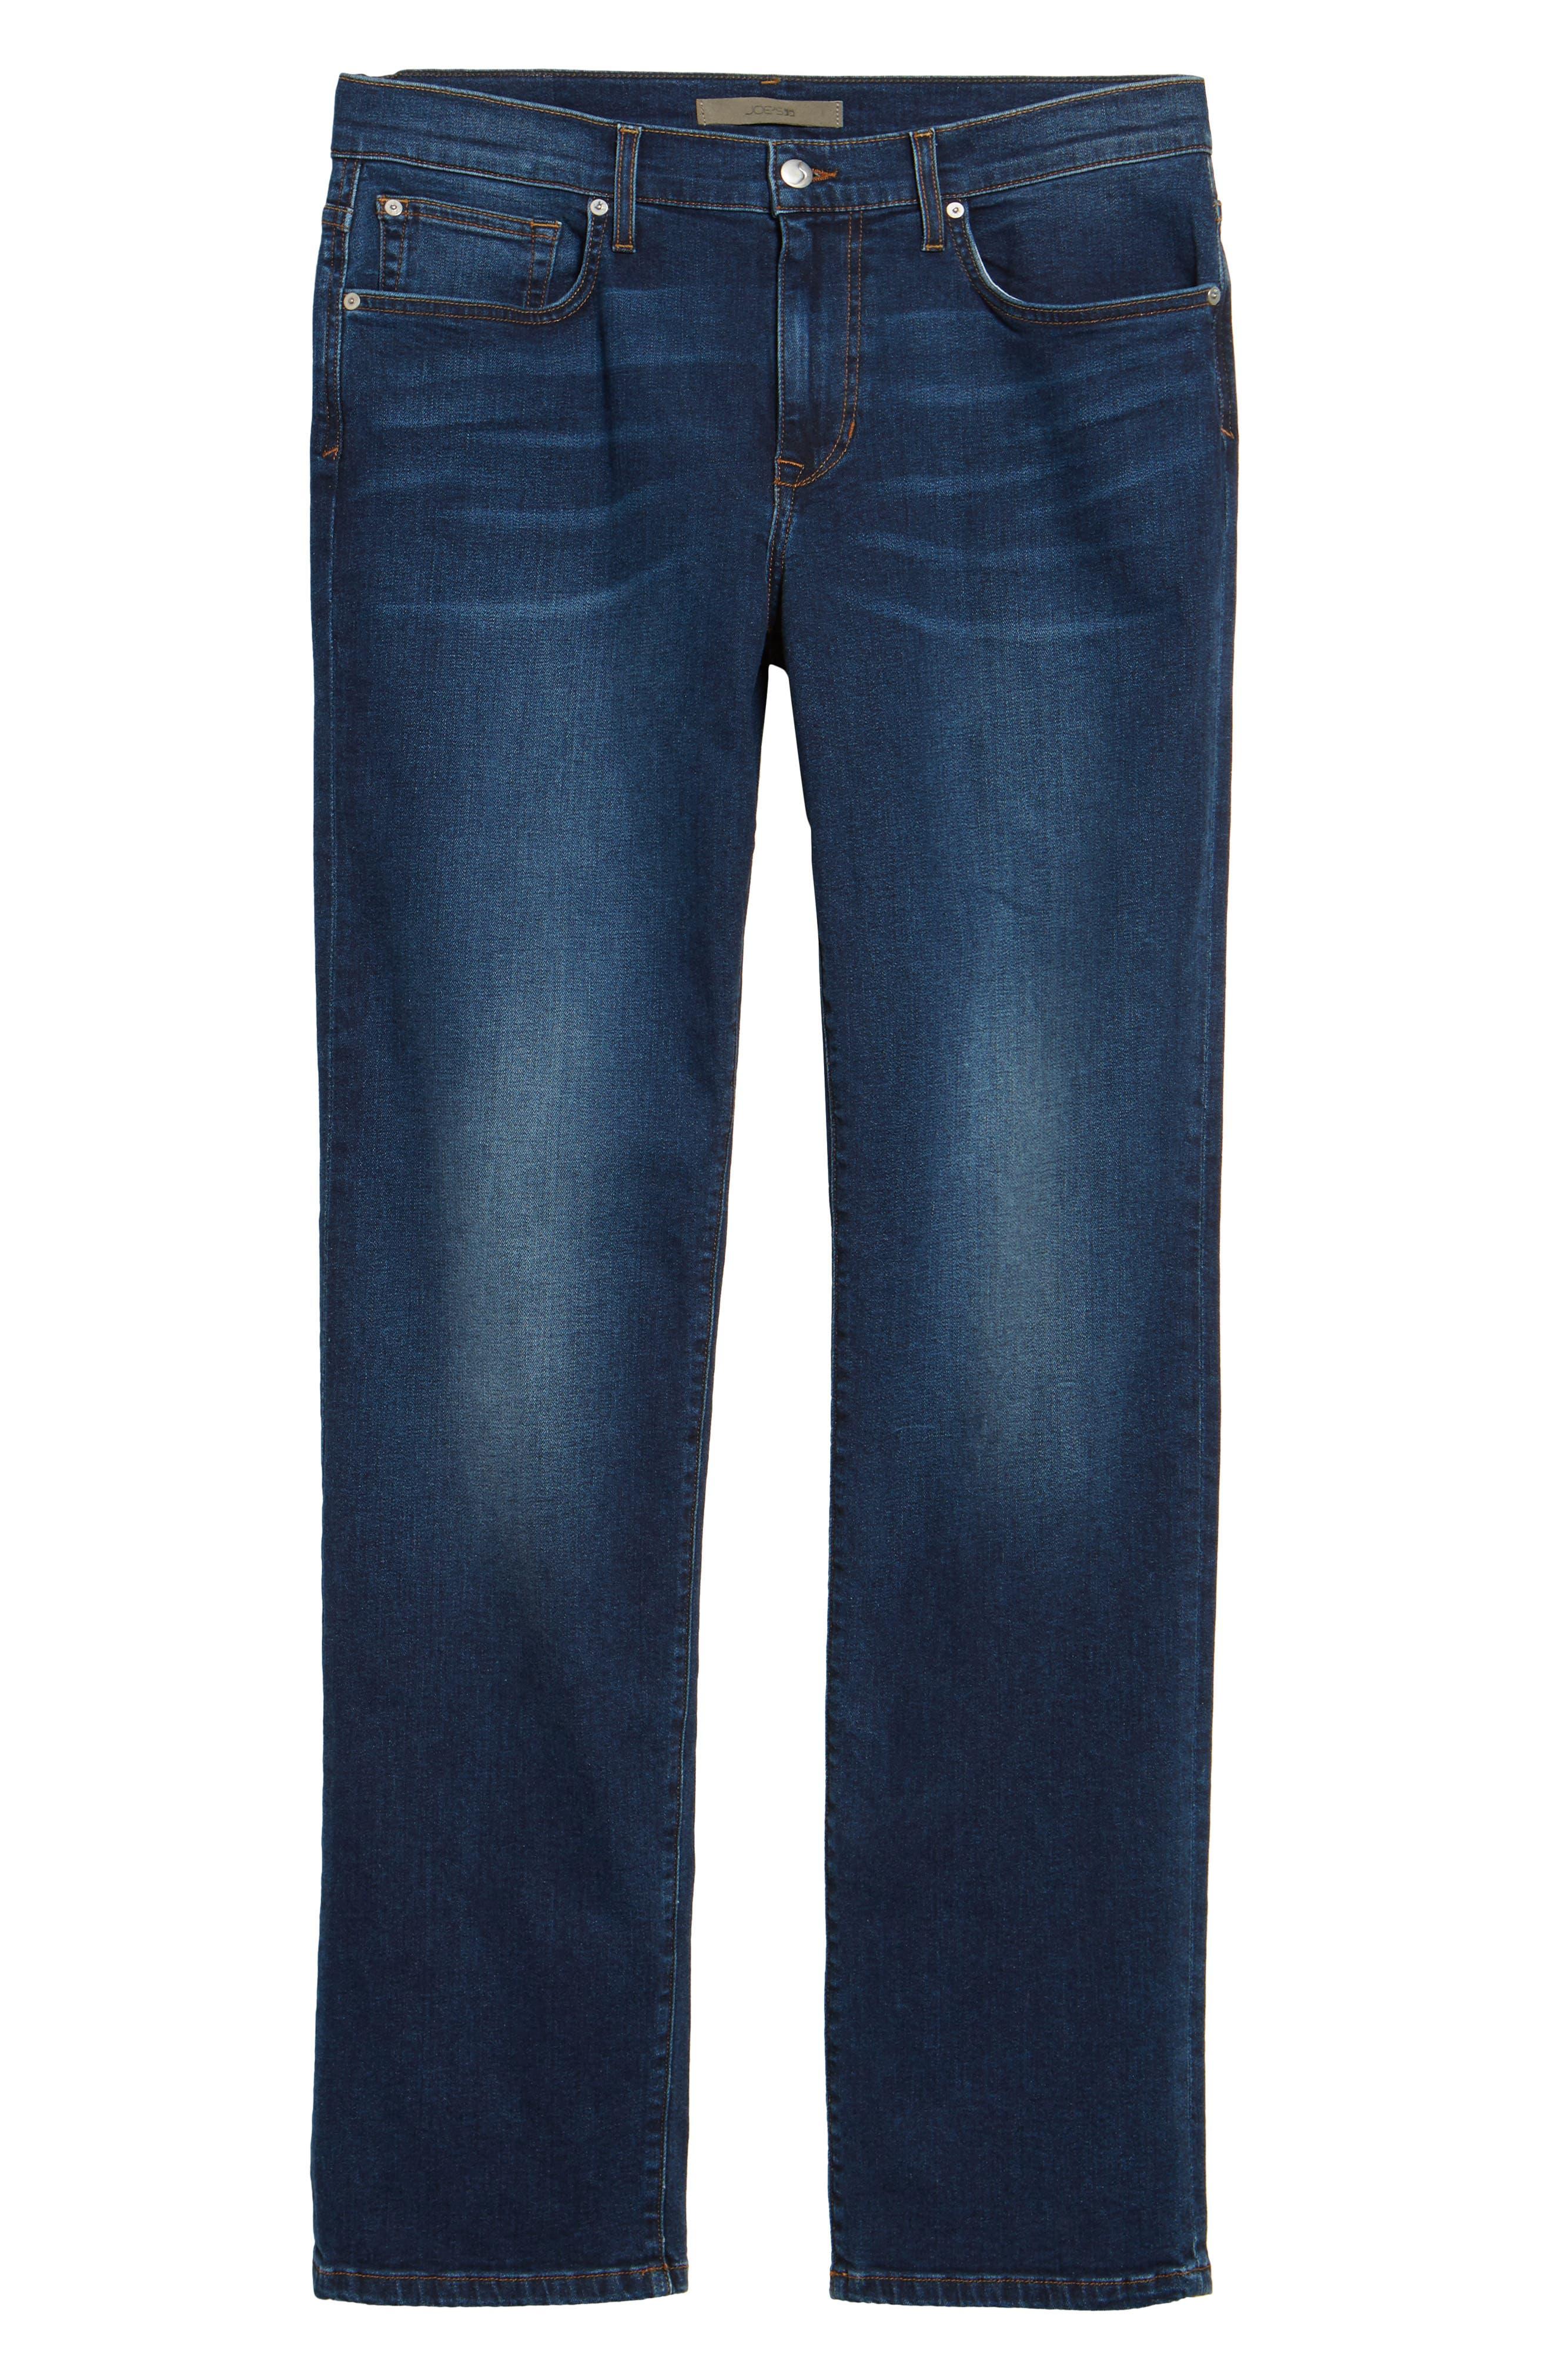 Brixton Slim Straight Leg Jeans,                             Alternate thumbnail 6, color,                             Line